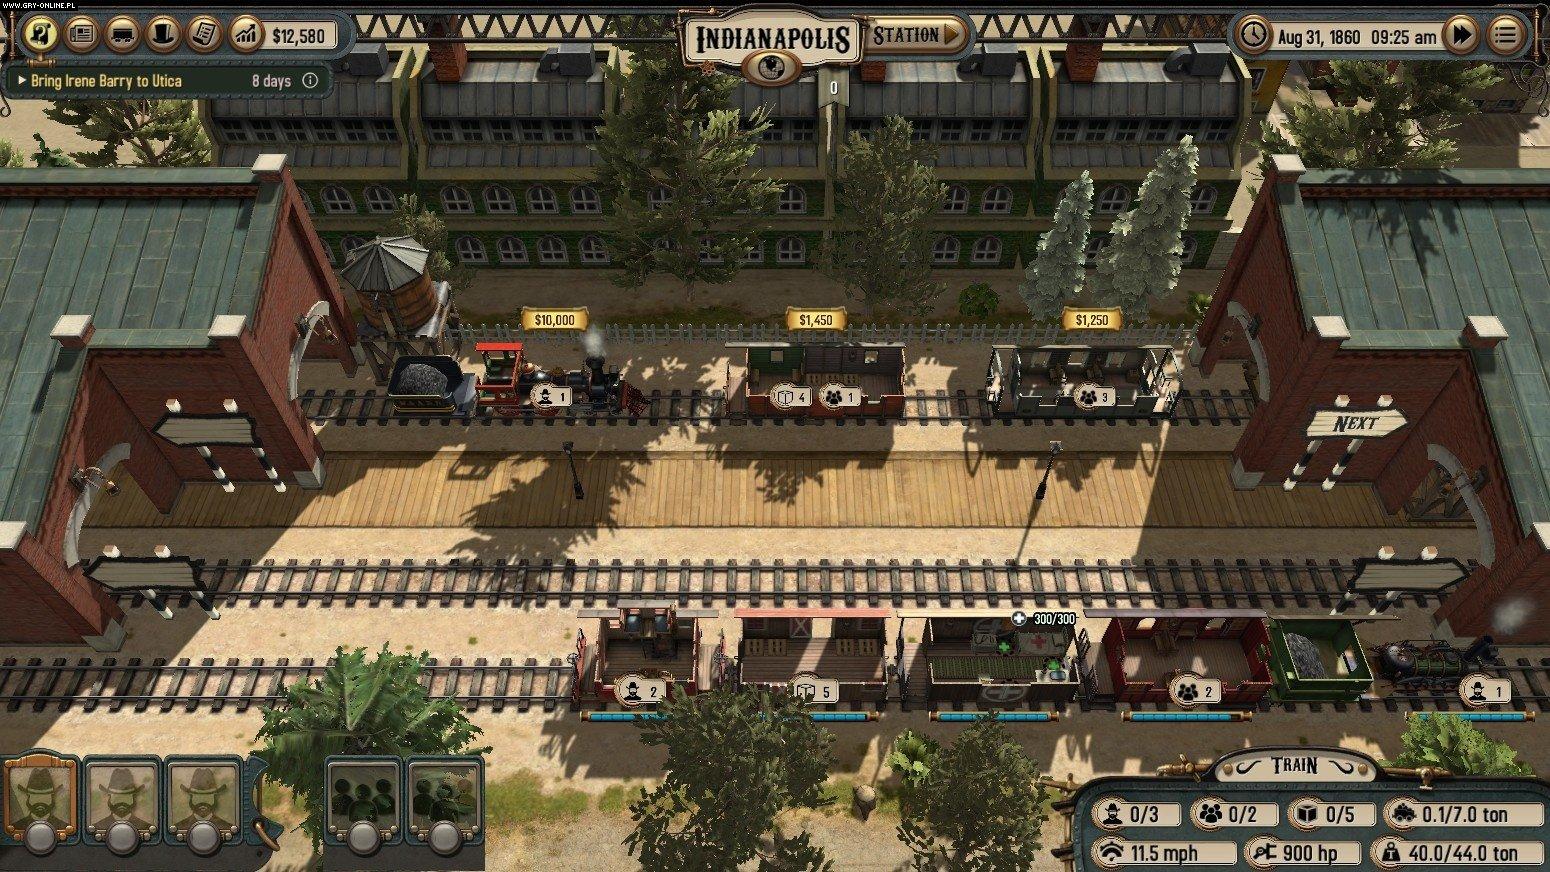 Bounty Train PC Games Image 8/26, Corbie Games, Daedalic Entertainment